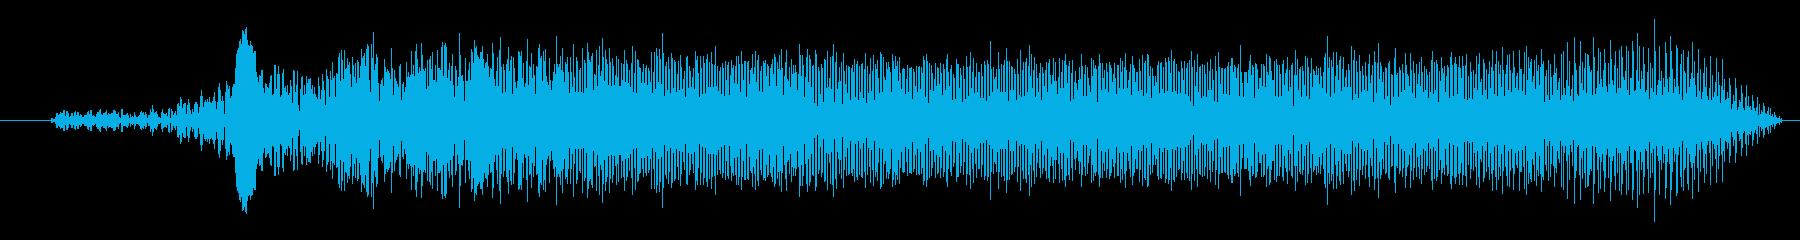 FX 作業ロボット01の再生済みの波形